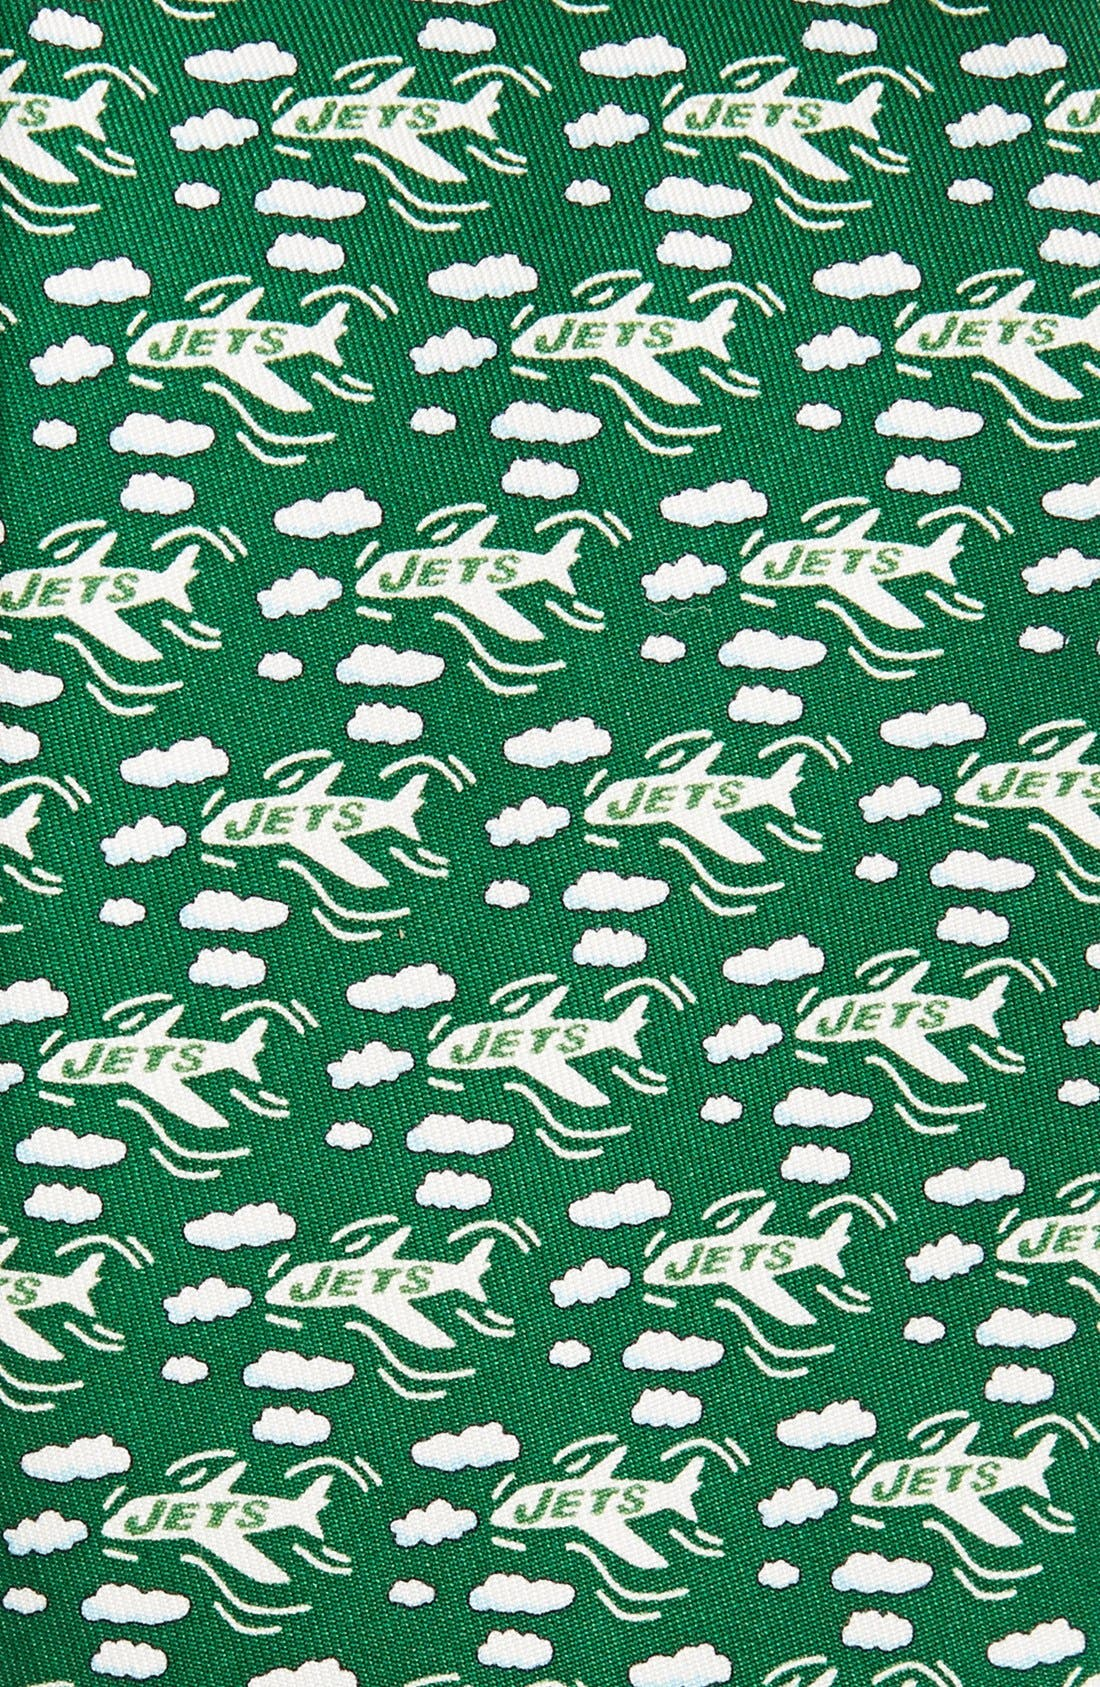 New York Jets - NFL Woven Silk Tie,                             Alternate thumbnail 2, color,